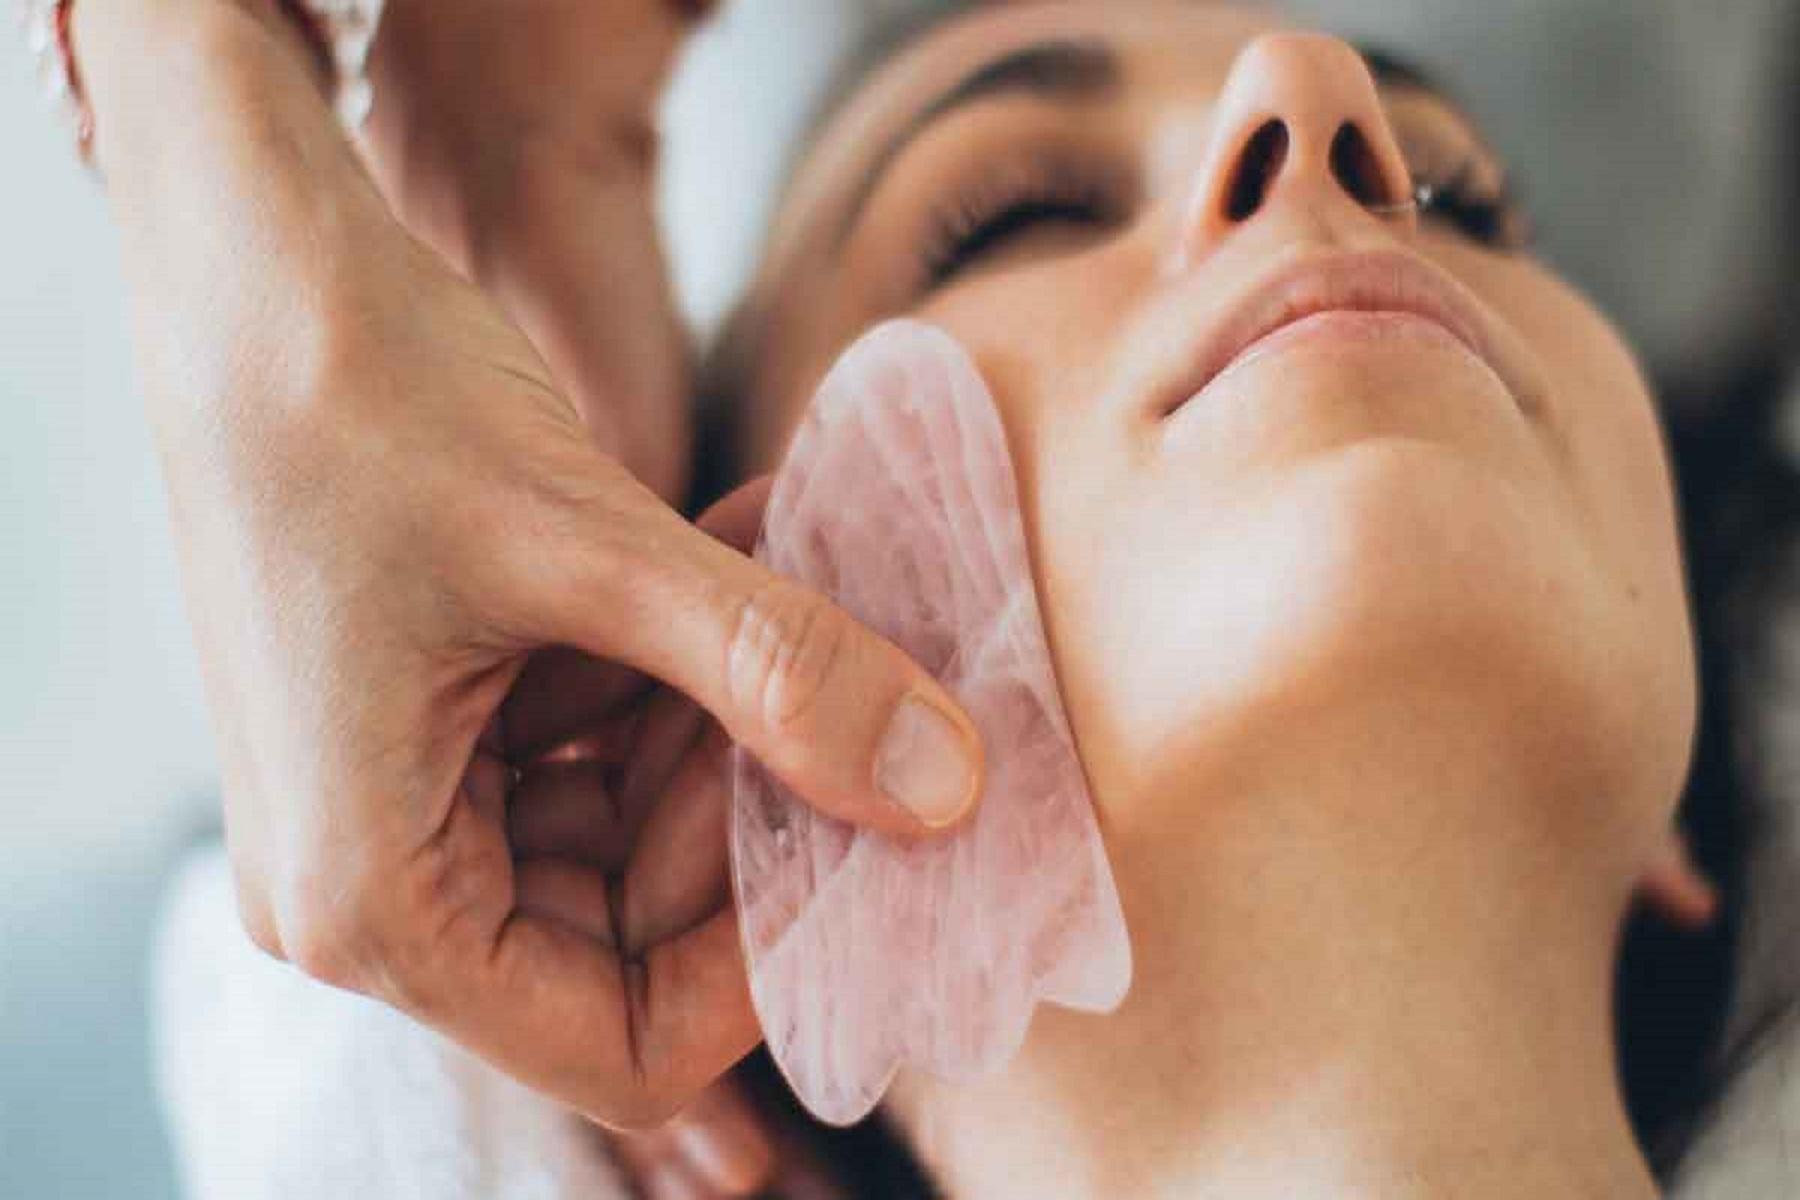 Rose Quartz Roller περιποίηση πρόσωπο: Το αγαπημένο εργαλείο των επαγγελματιών ομορφιάς αλλά και των σταρς